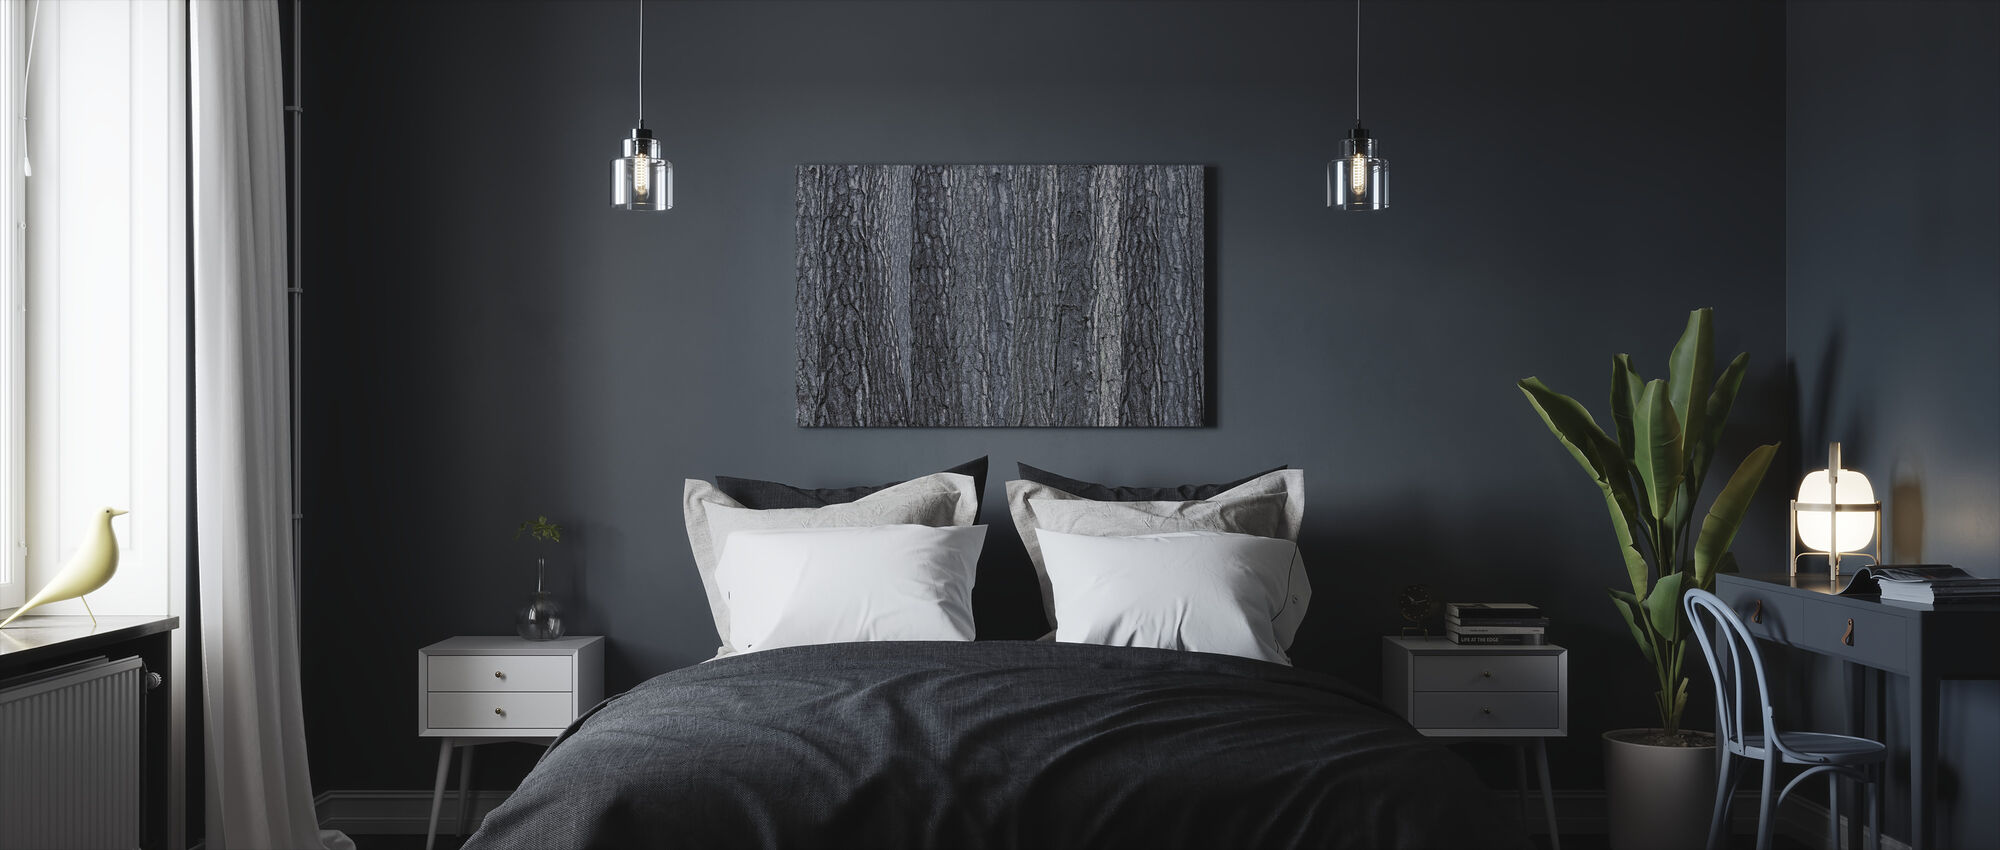 Zwarte Blauwe schors - Canvas print - Slaapkamer